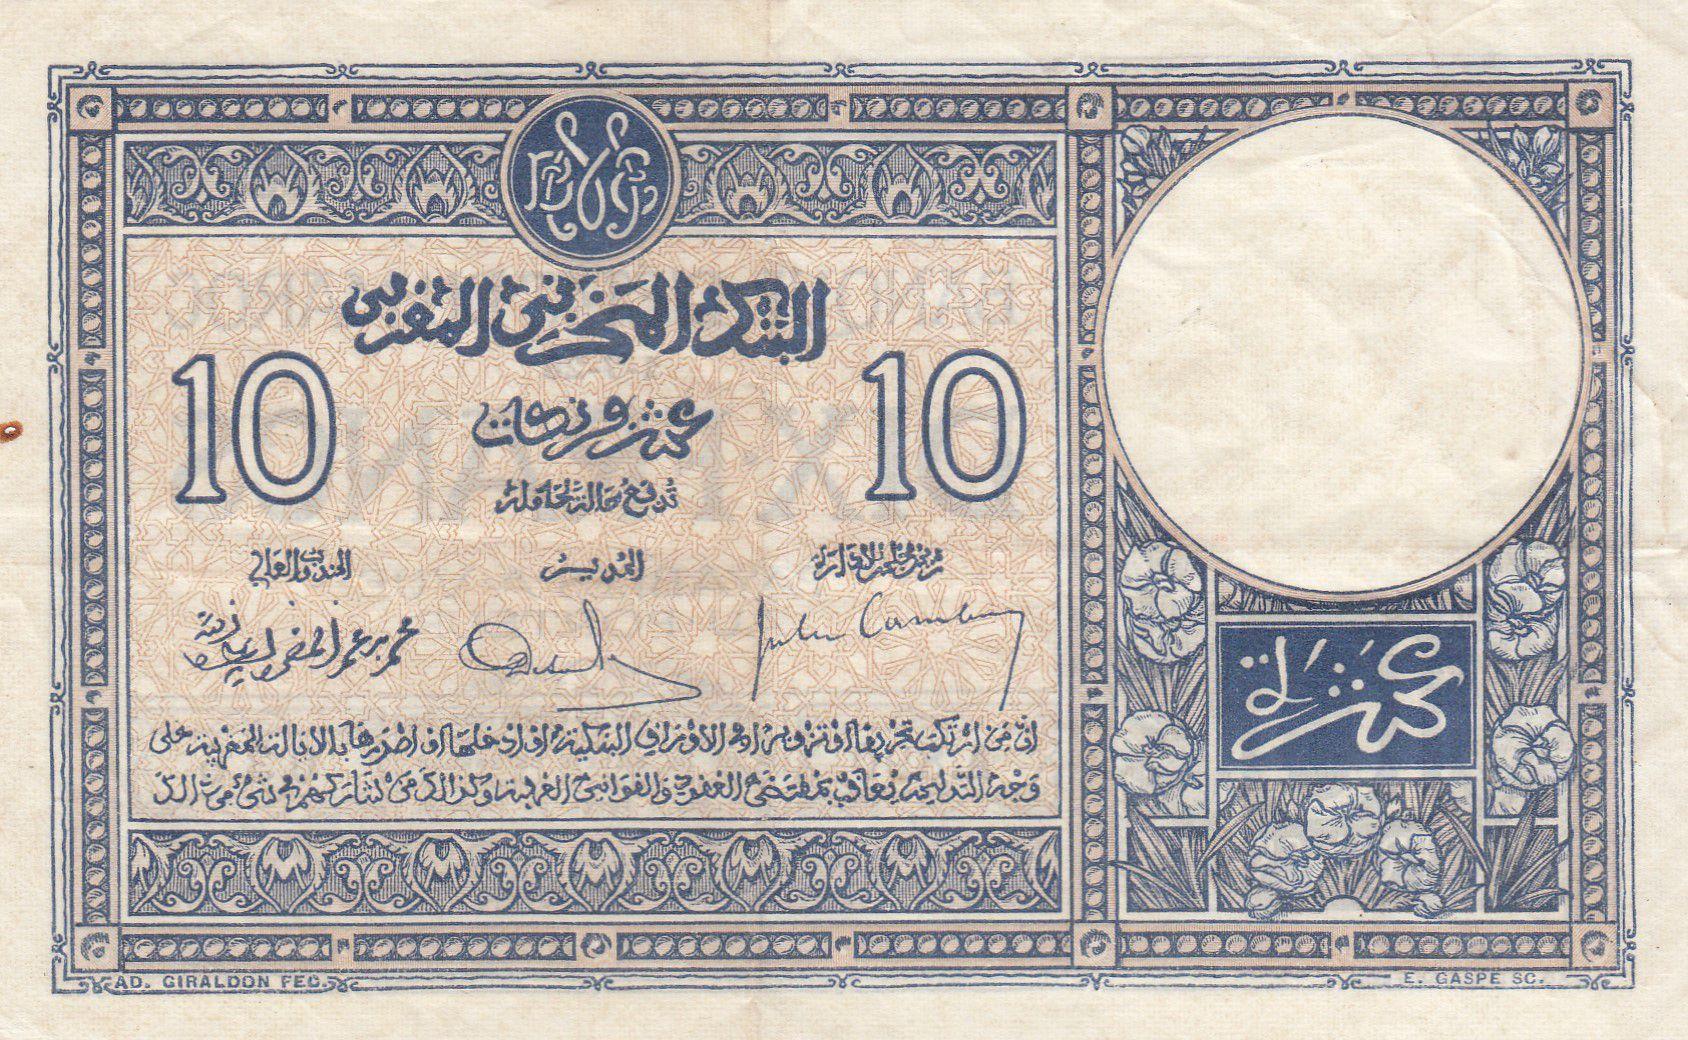 Maroc 10 Francs 01-07-1928 - TTB - Série A.890 - P.11b